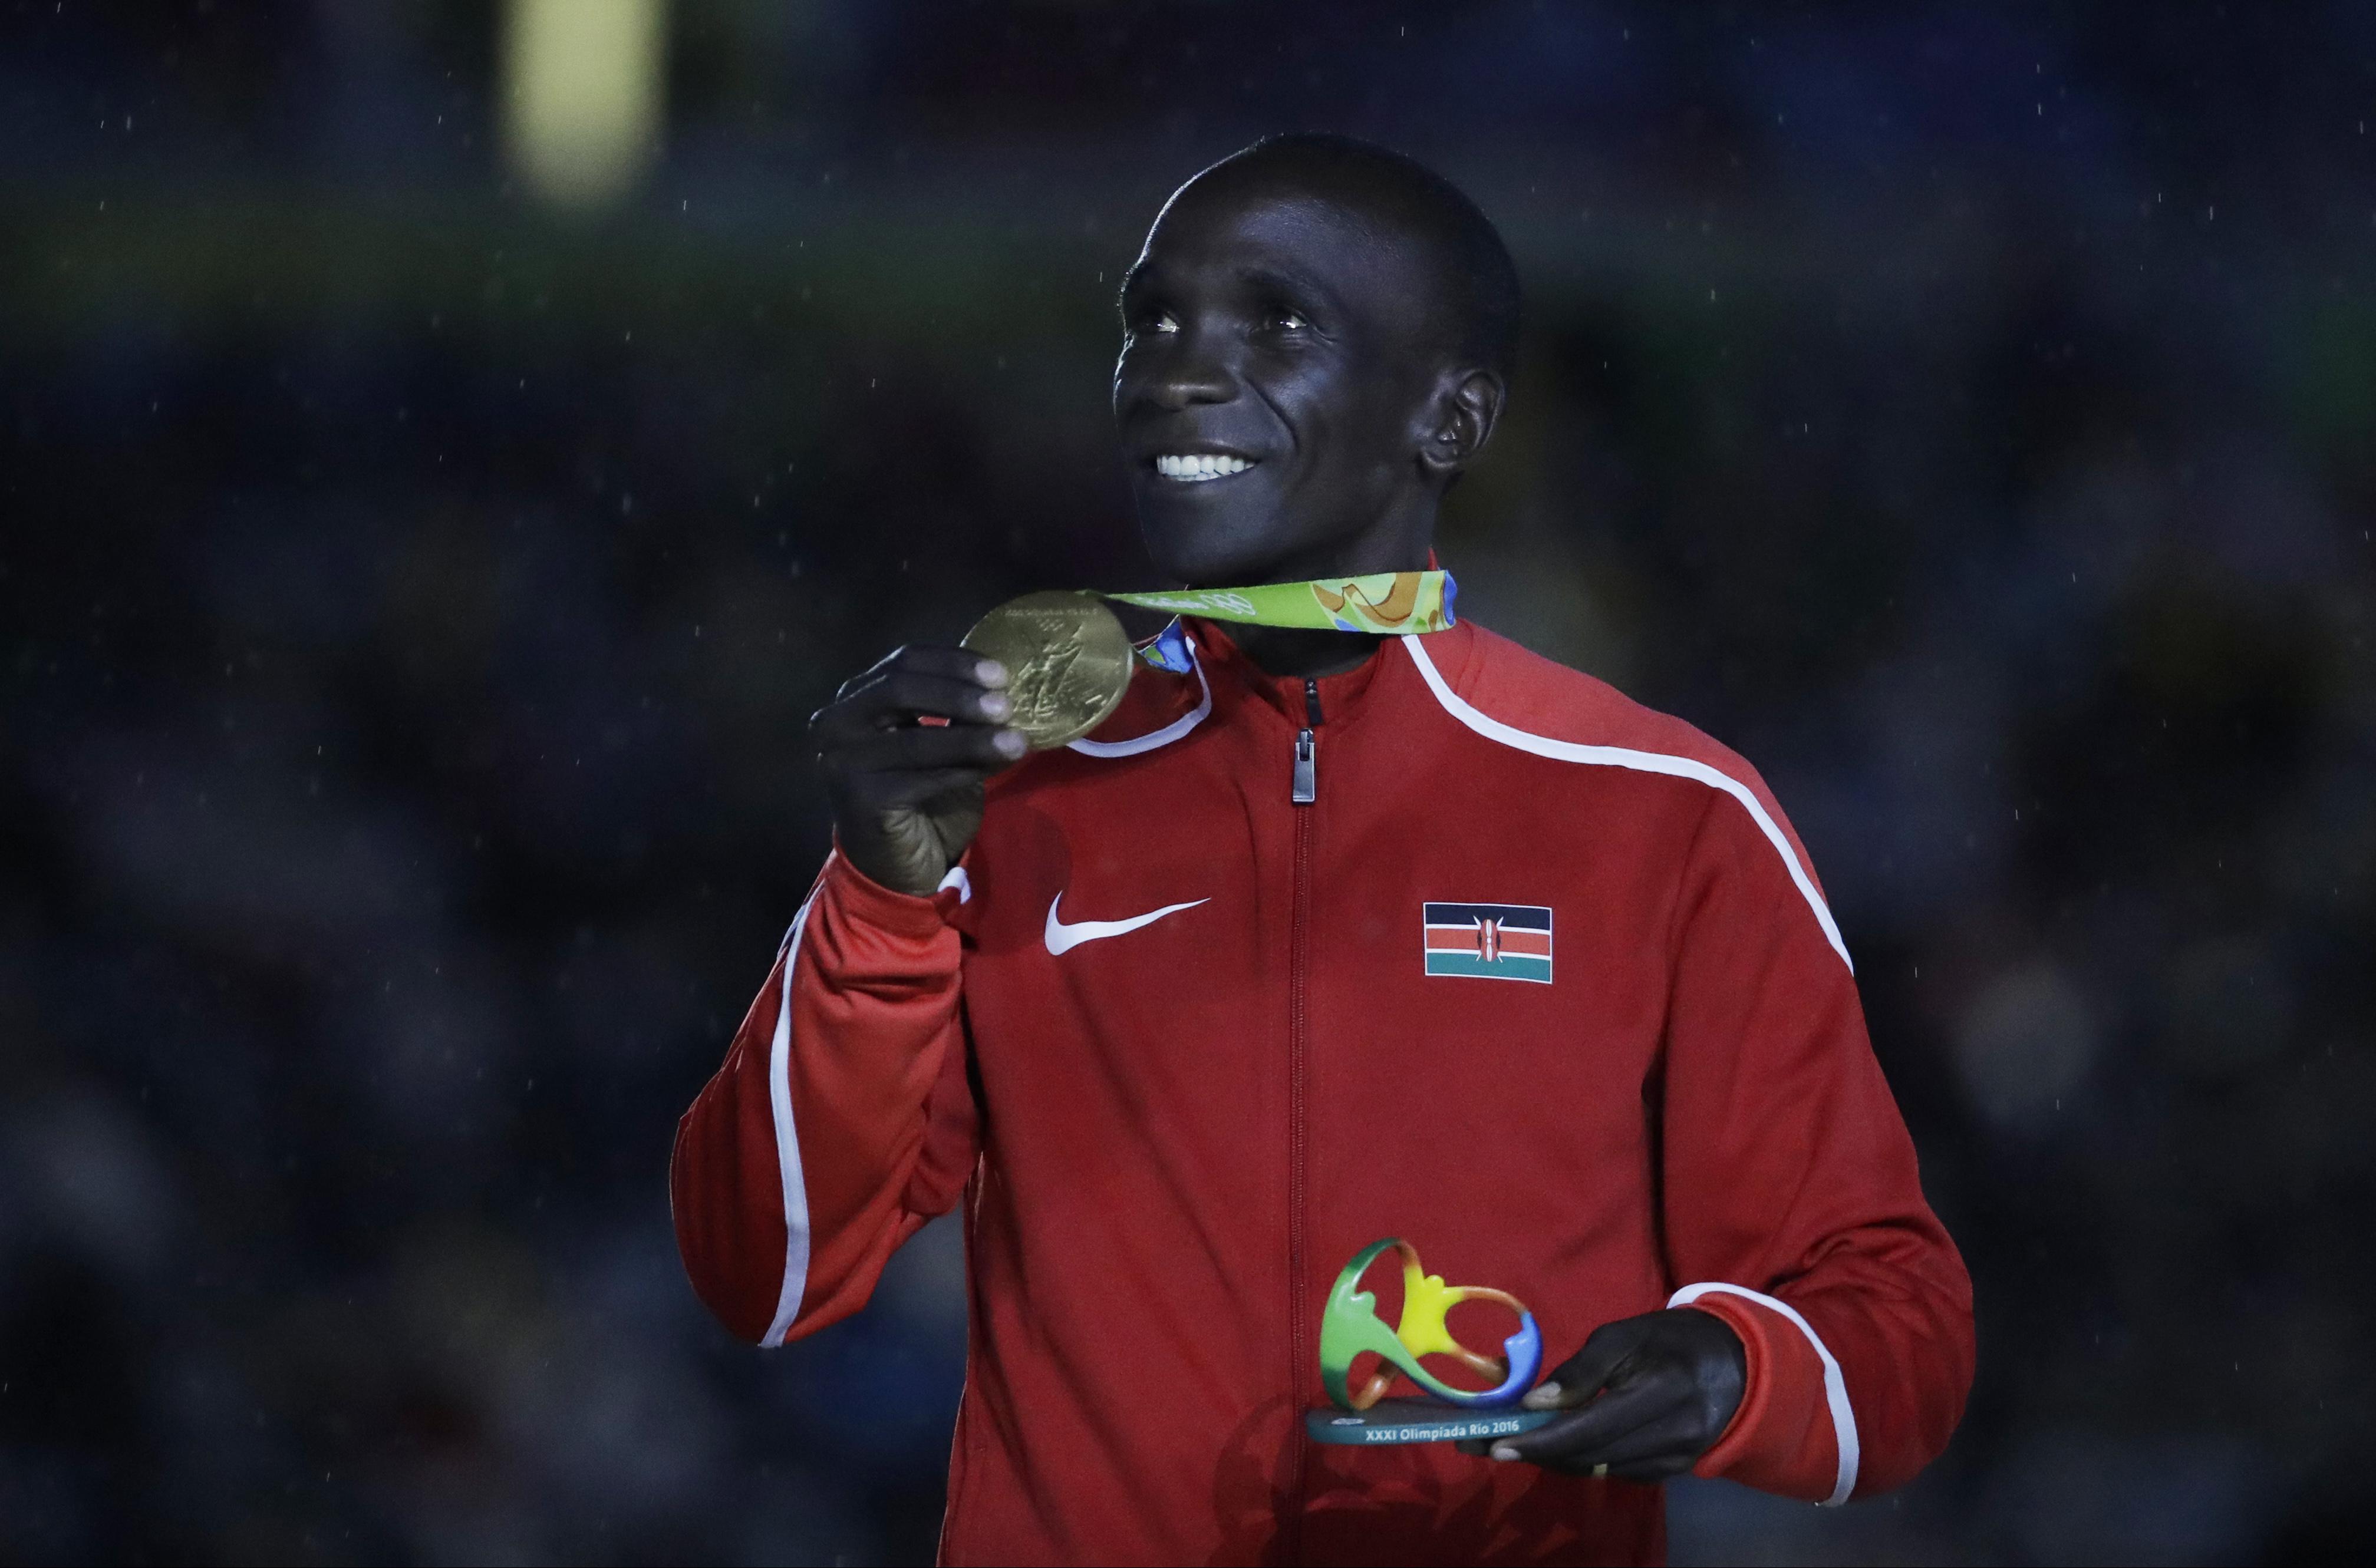 Kenya's gold medal winner Eliud Kipchoge poses during the medal ceremony for the men's marathon during the closing ceremony in the Maracana stadium at the 2016 Summer Olympics in Rio de Janeiro, Brazil, Sunday, Aug. 21, 2016.